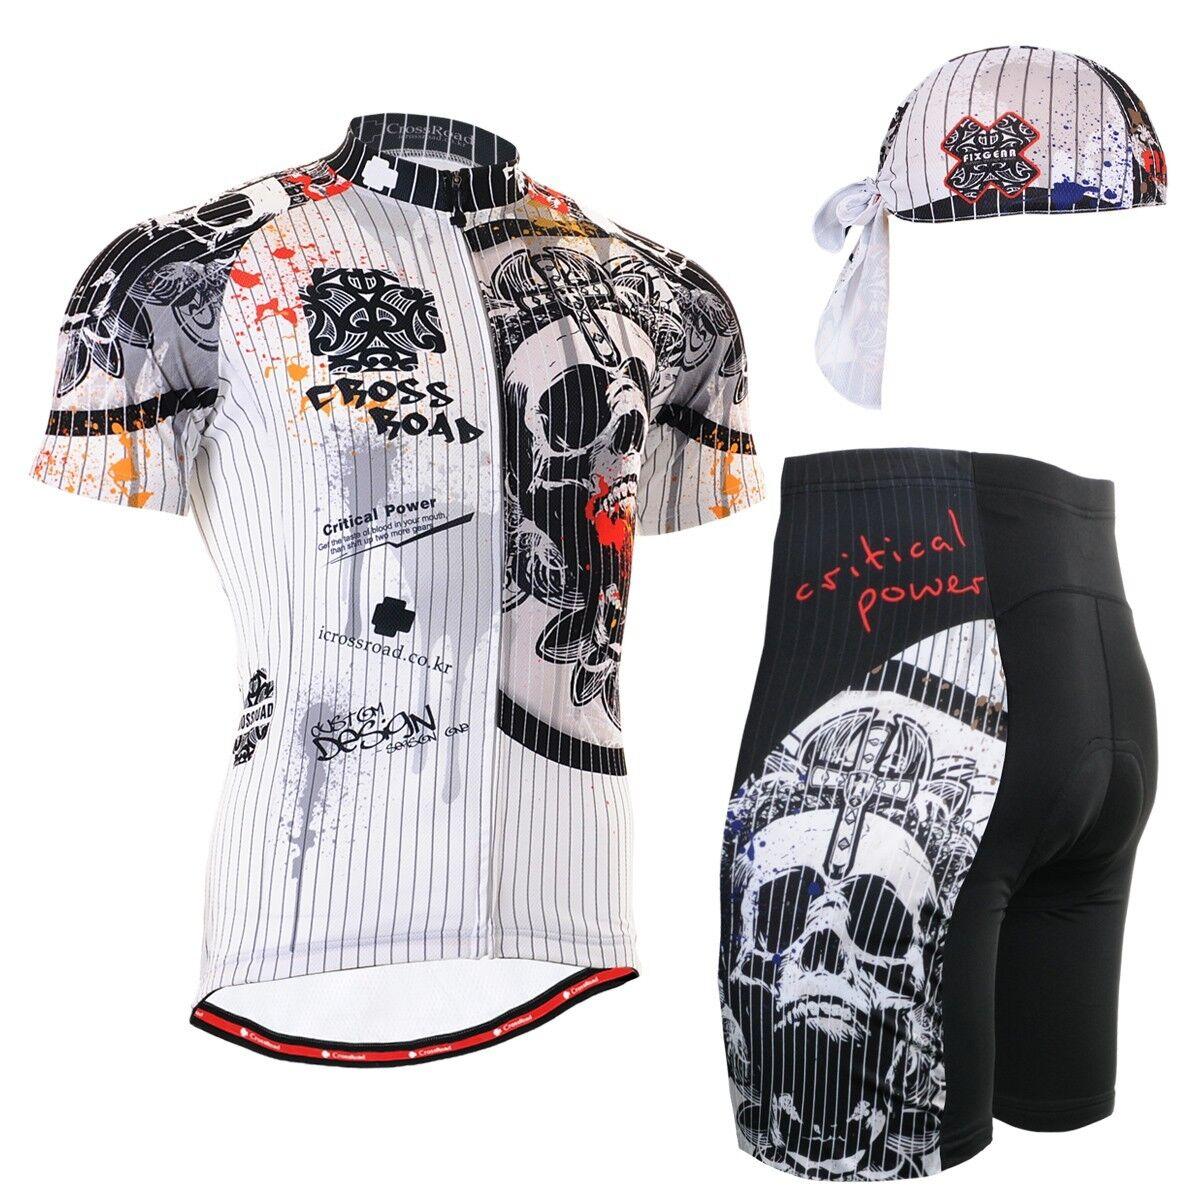 FIXGEAR CS-902-SET Cycling Jersey & Shorts Padded, Bicycle Wear, MTB Road Bike